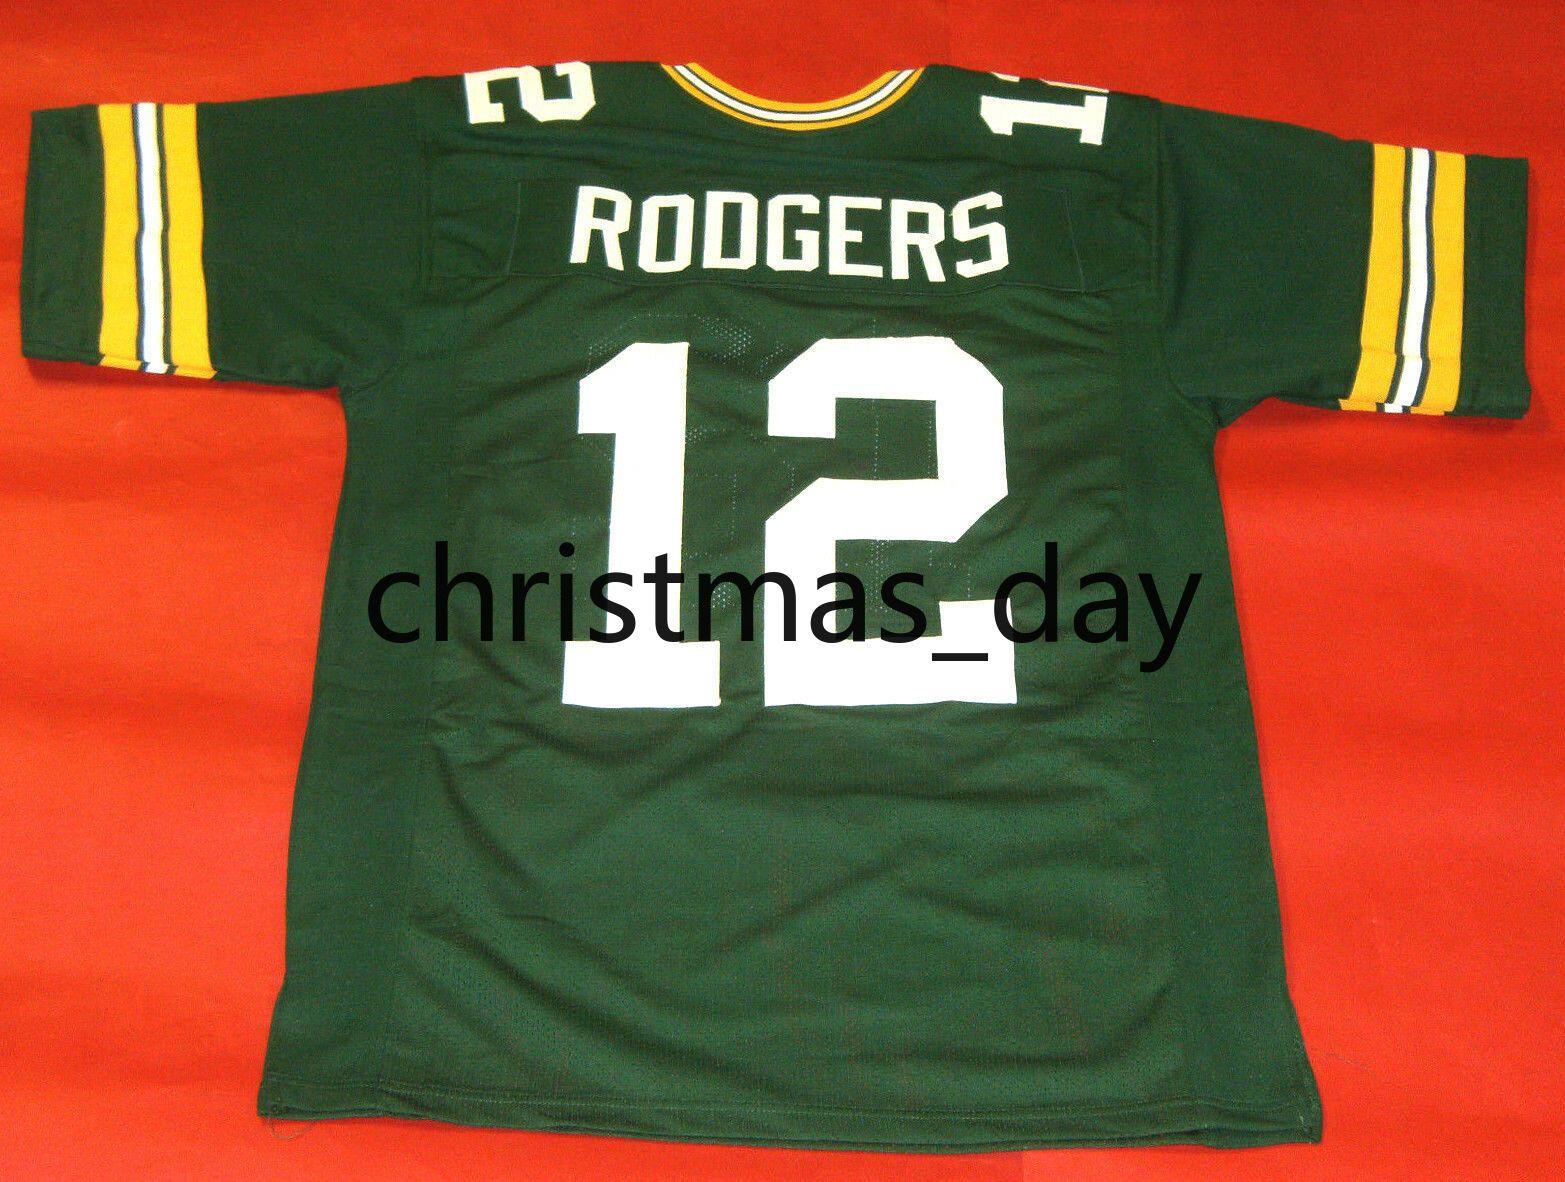 Günstige individuelle Aaron Rodgers Fußball Jersey Jeder Name Anzahl genähtes Jersey XS-5XL Customized